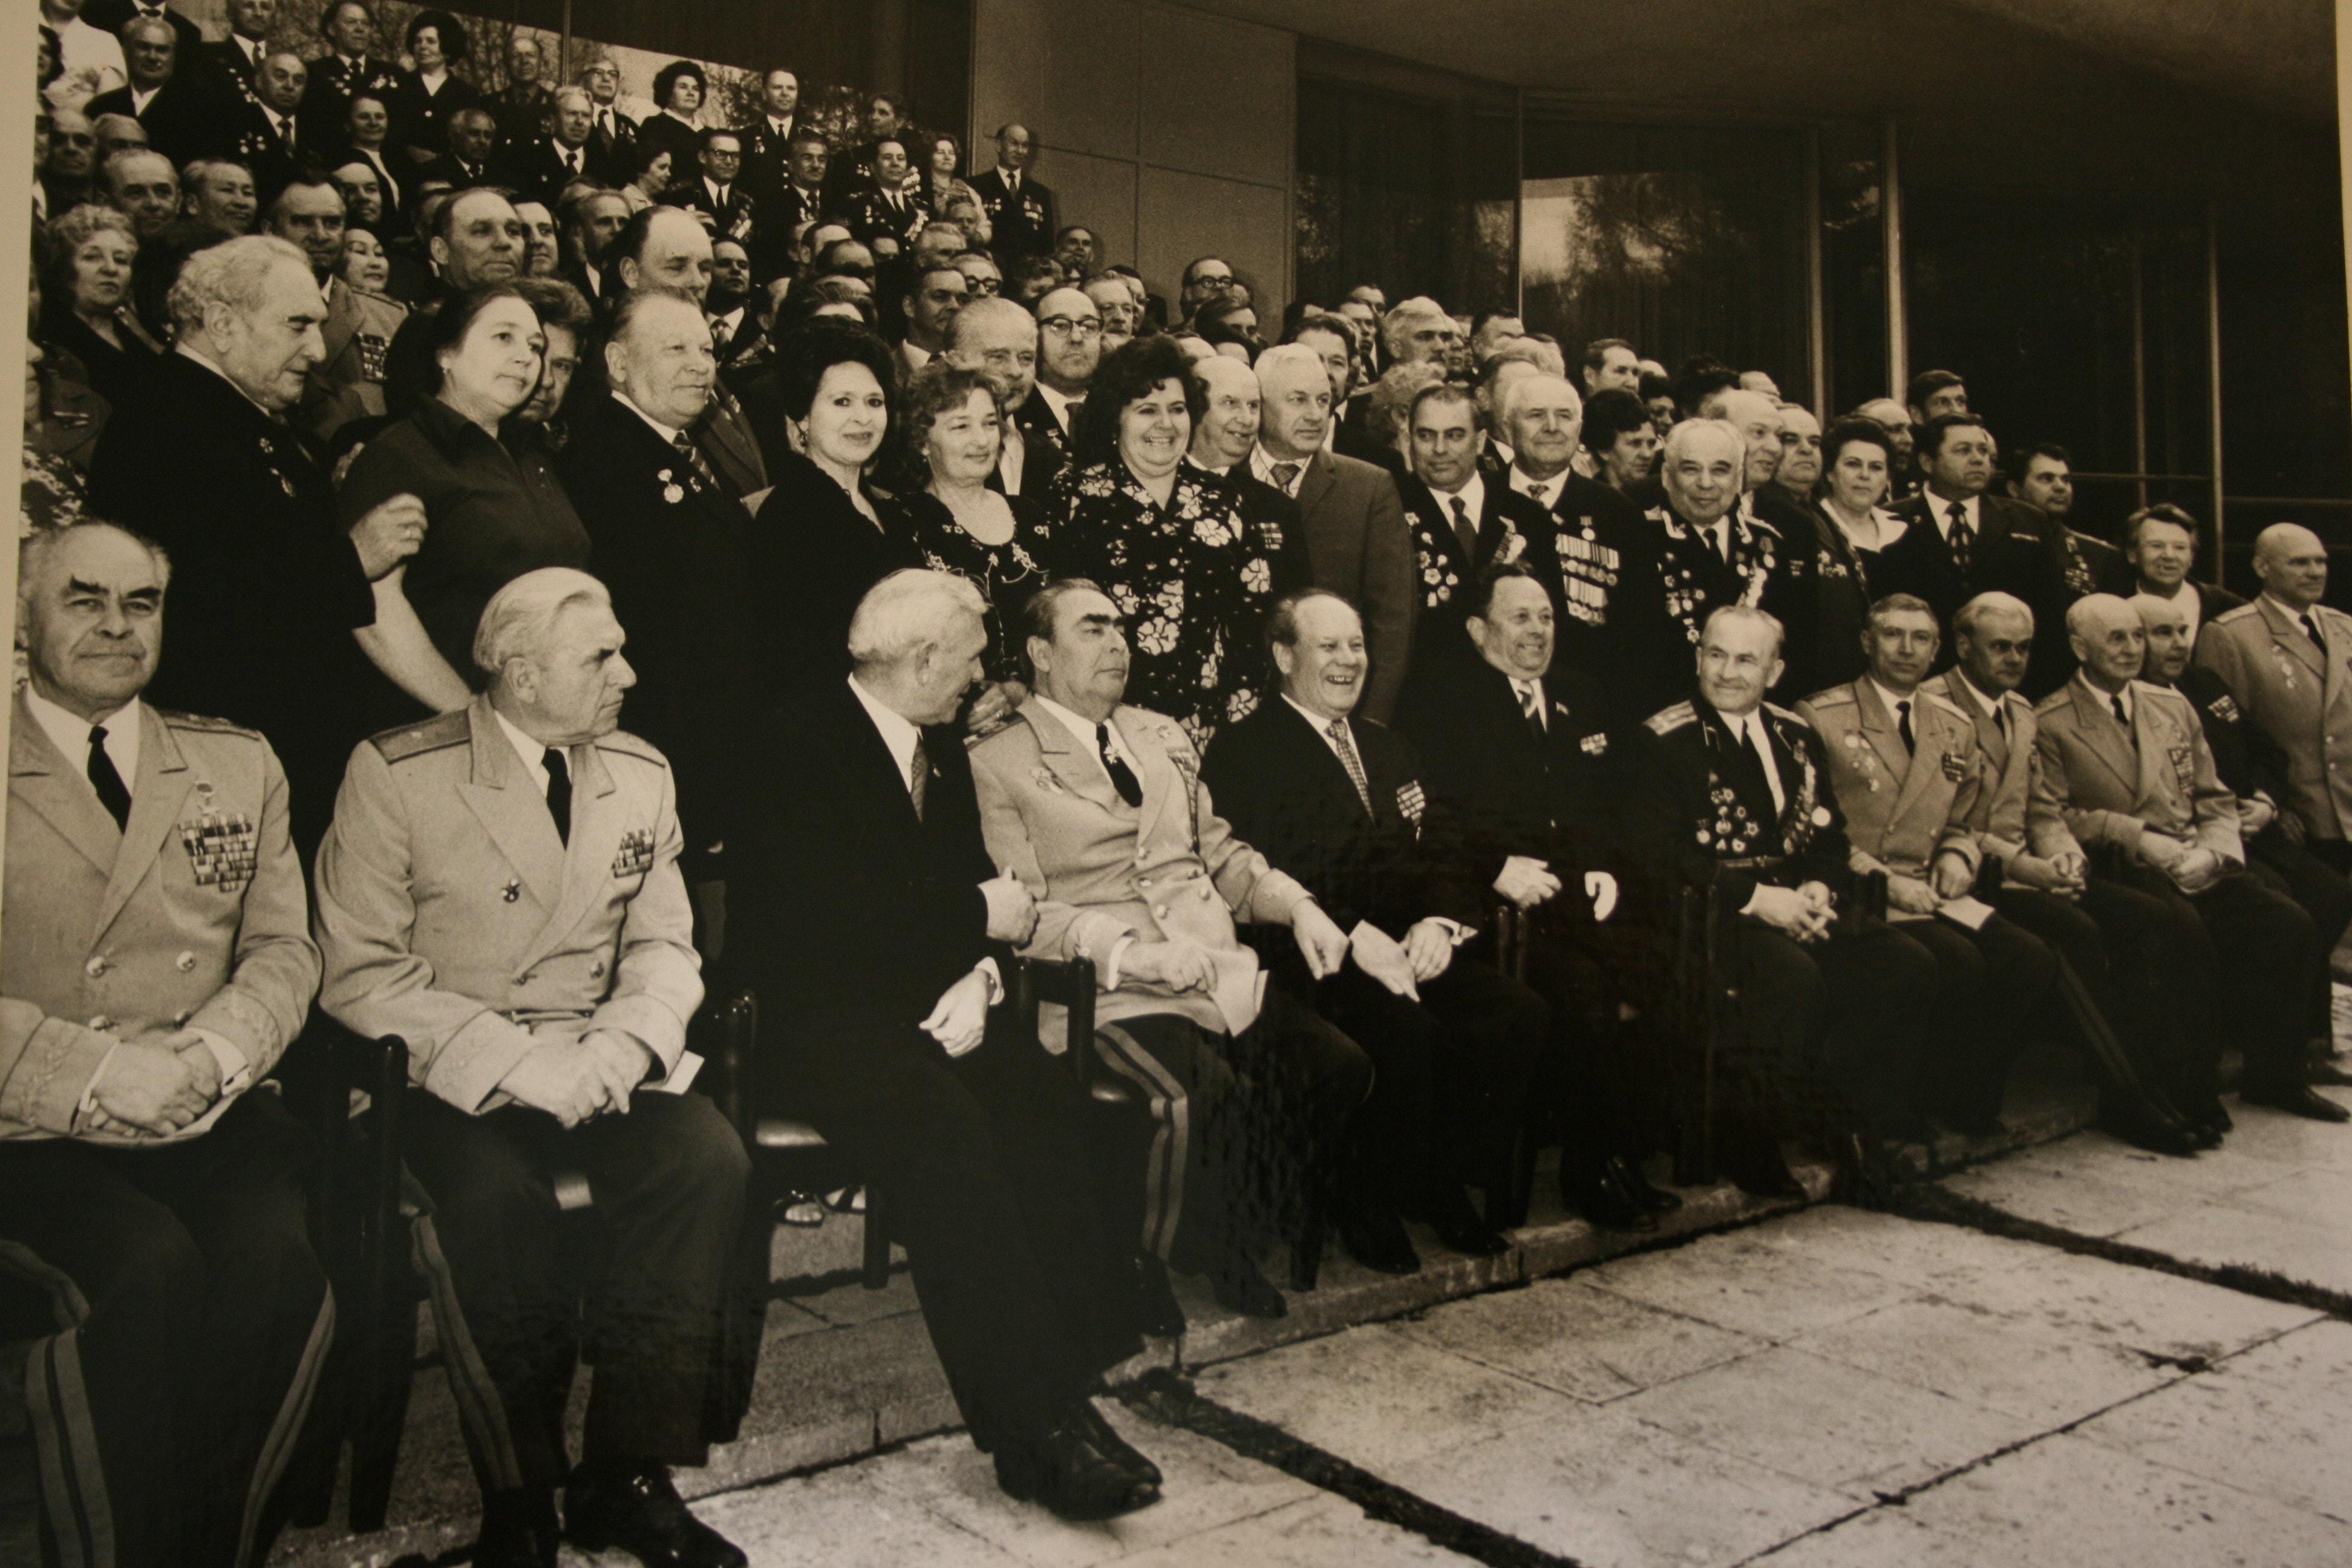 Leonid-Brezhnev-in-1976-with-fellow-Soviet-leaders